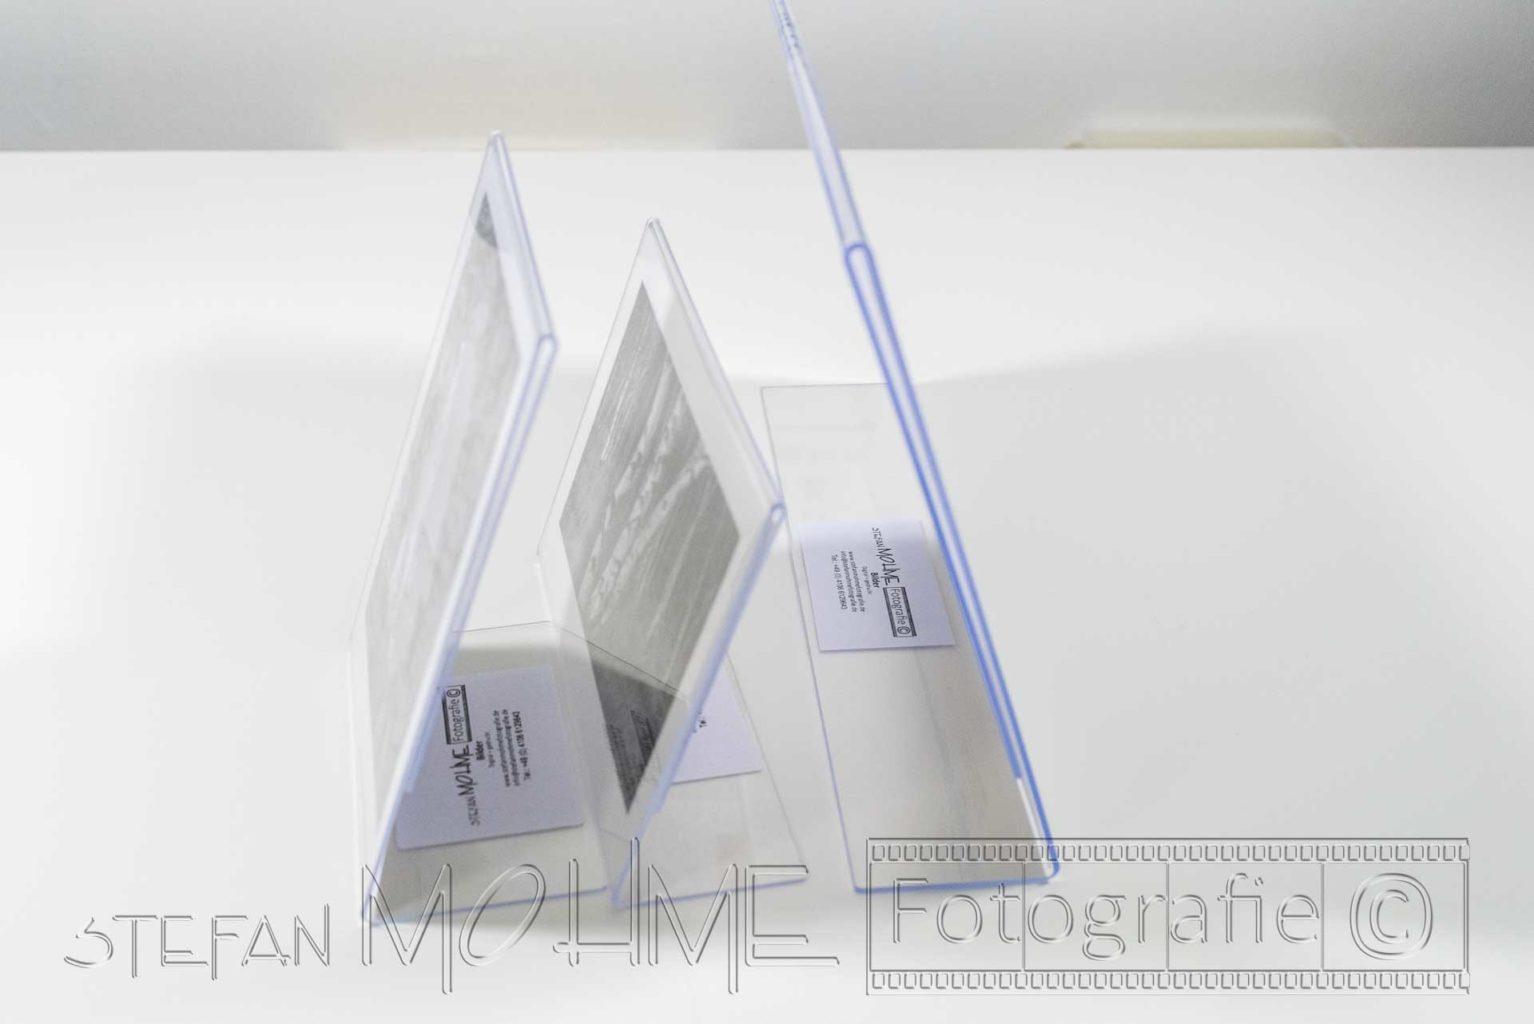 Verschiedene Acryl fotorahmen